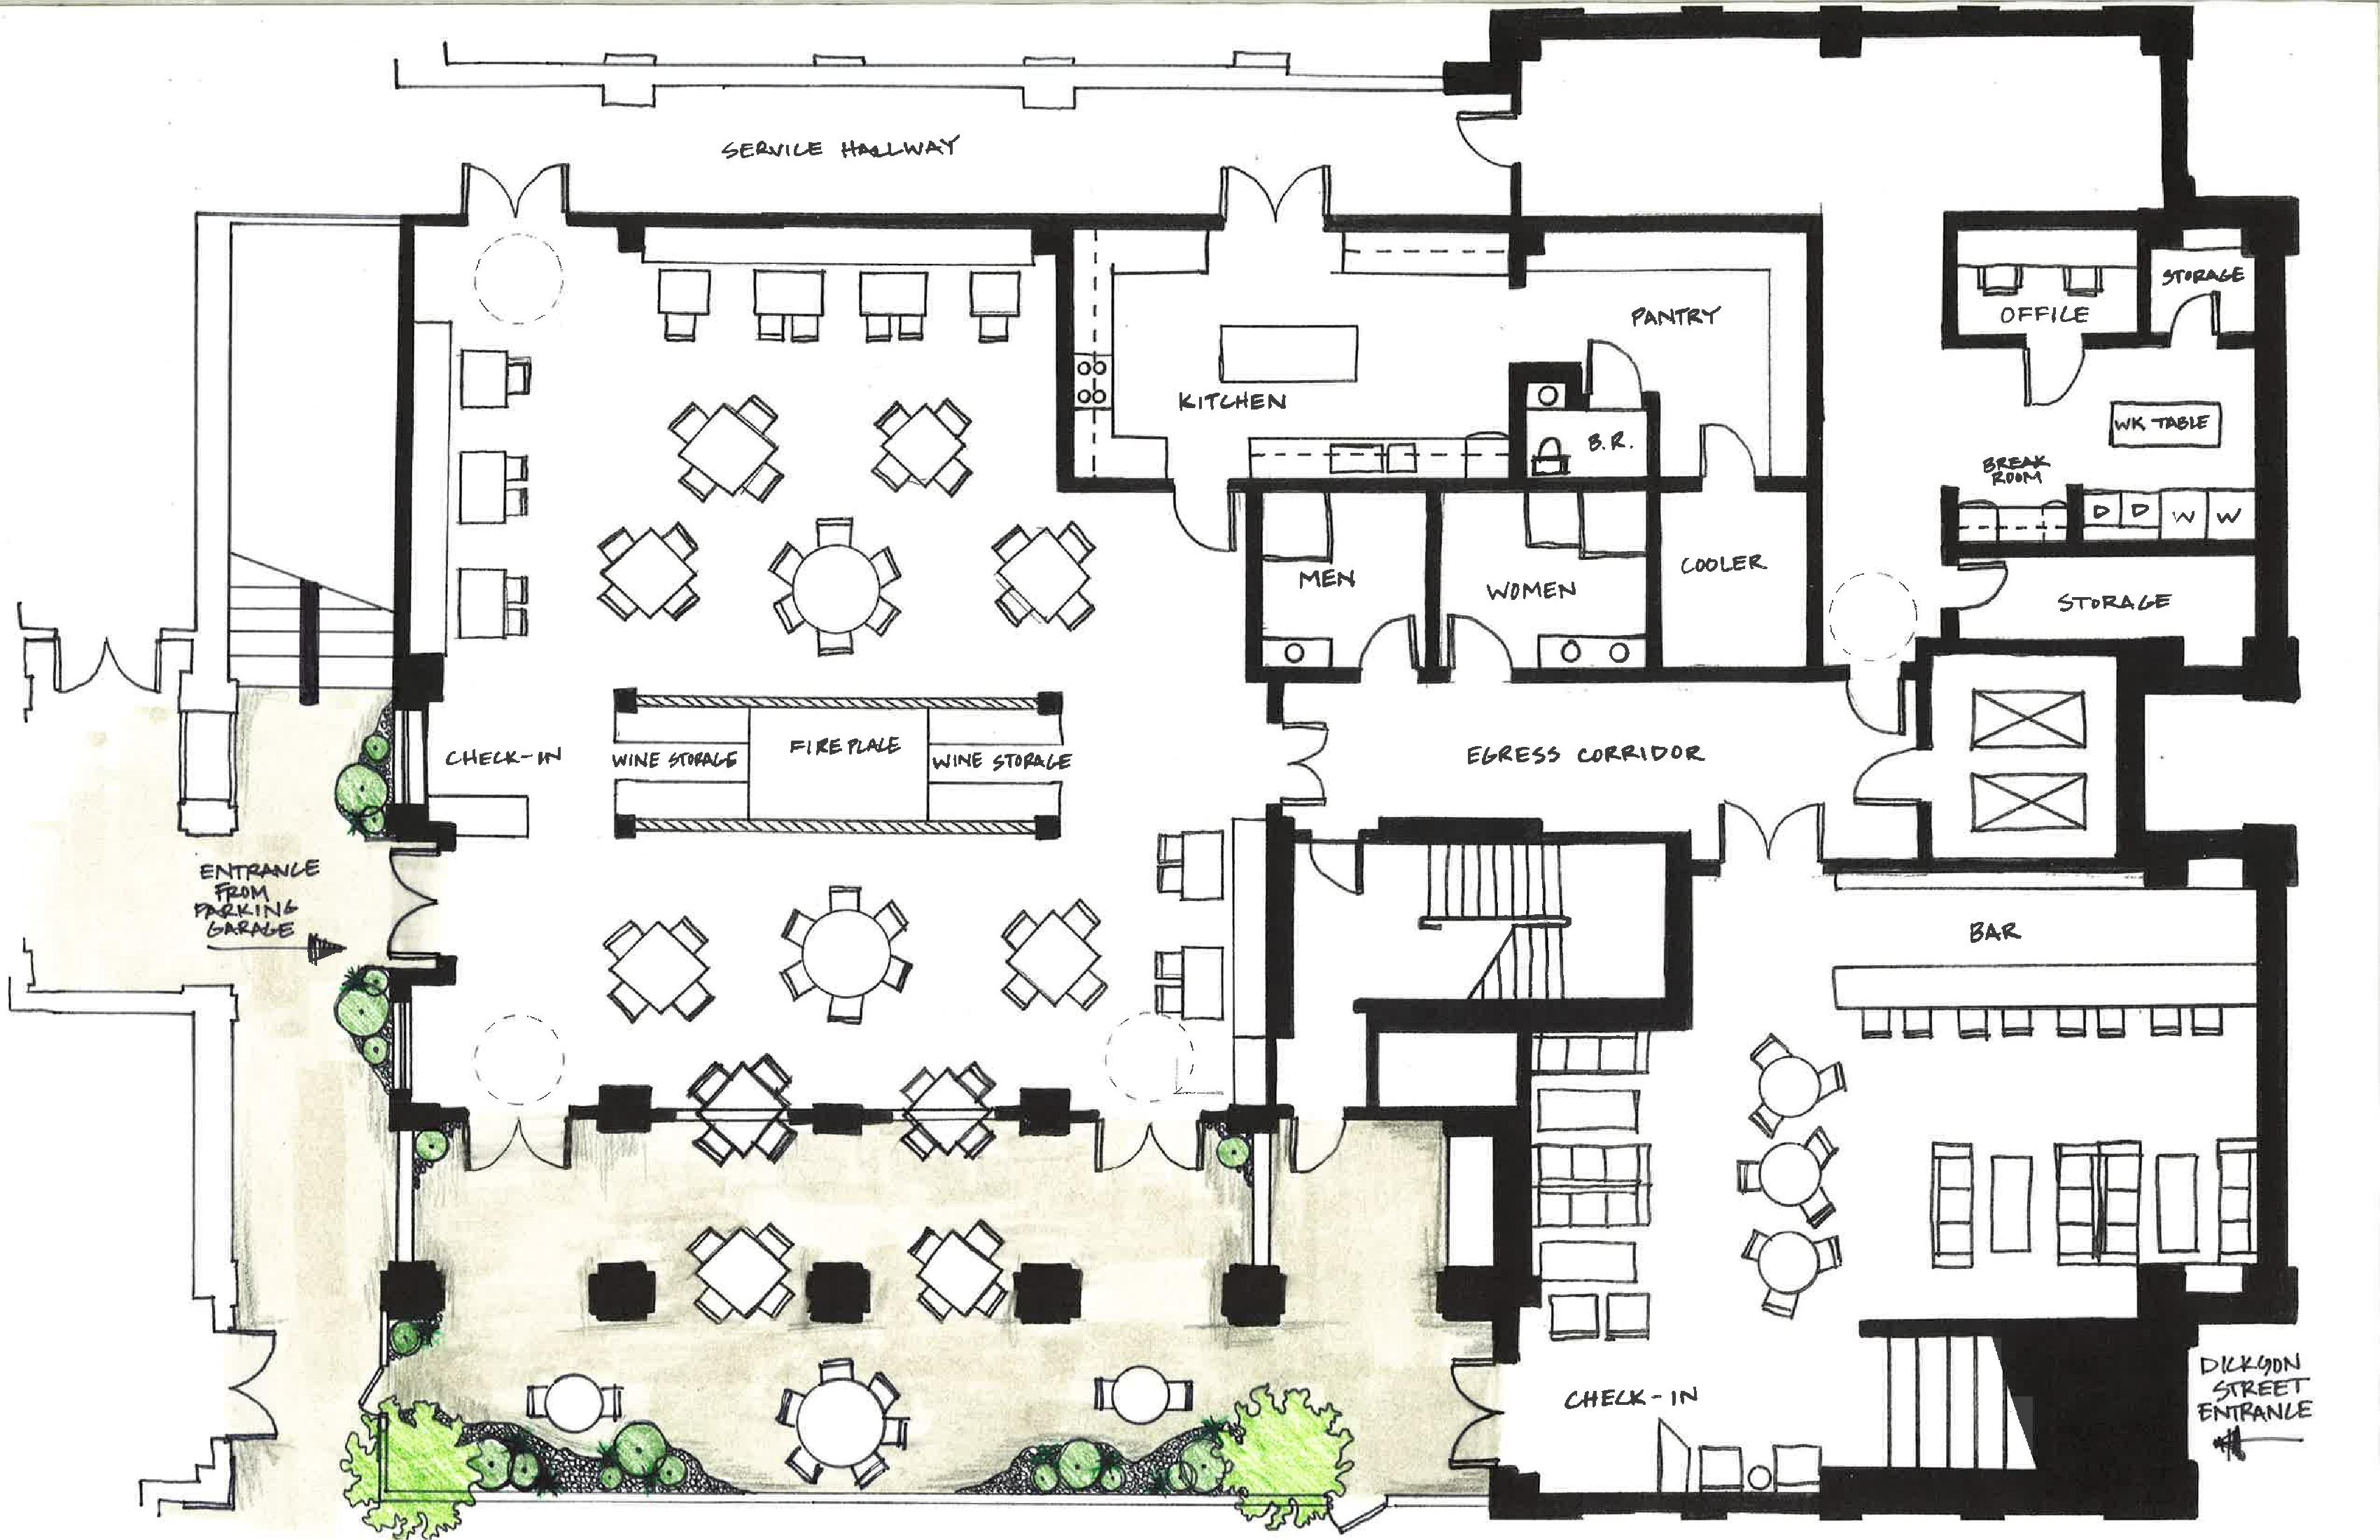 Designing A Restaurant Floor Plan